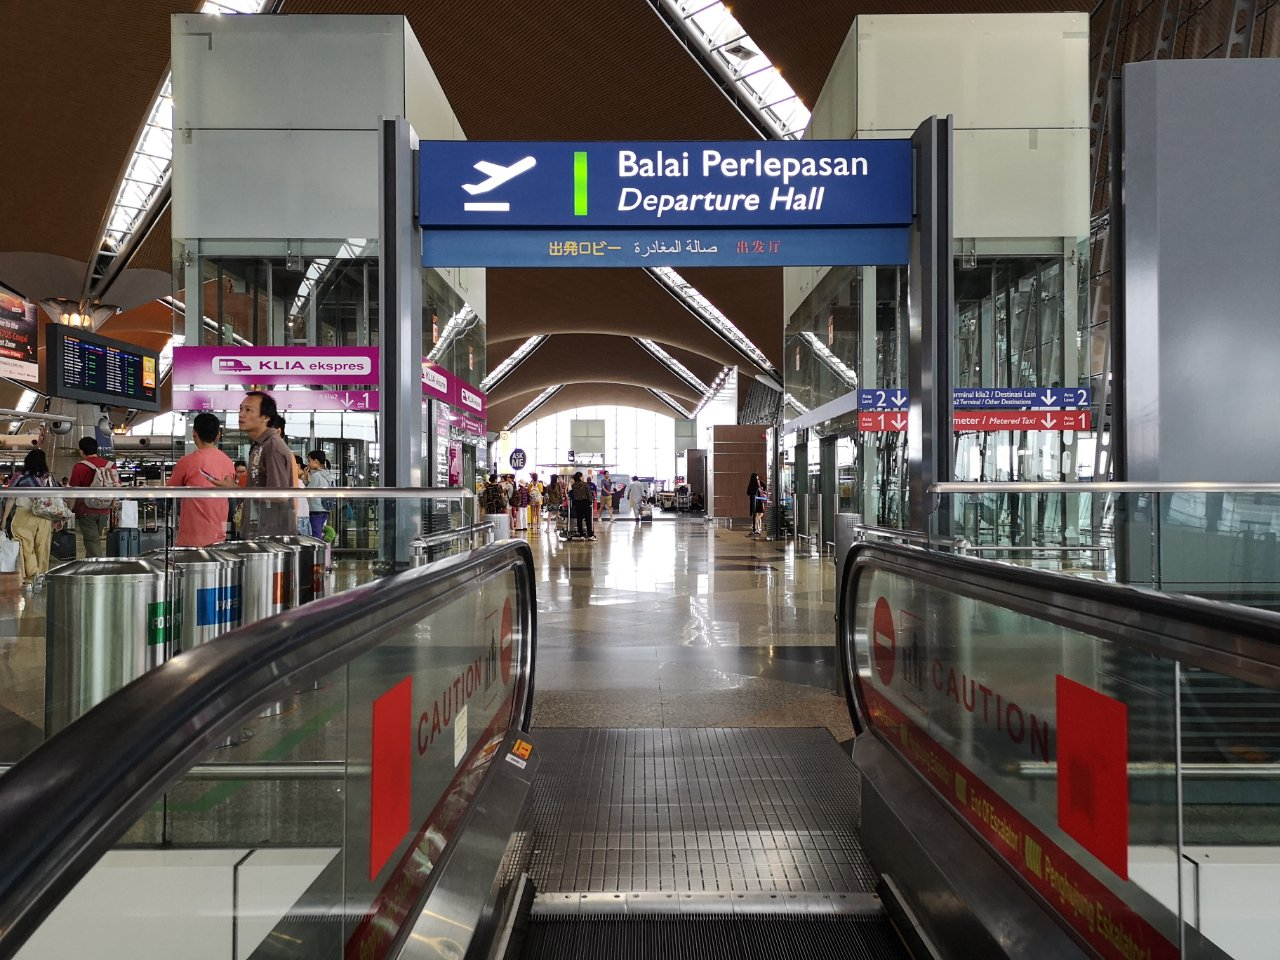 KLセントラル駅からバスでクアラルンプール国際空港にバスで移動する方法33